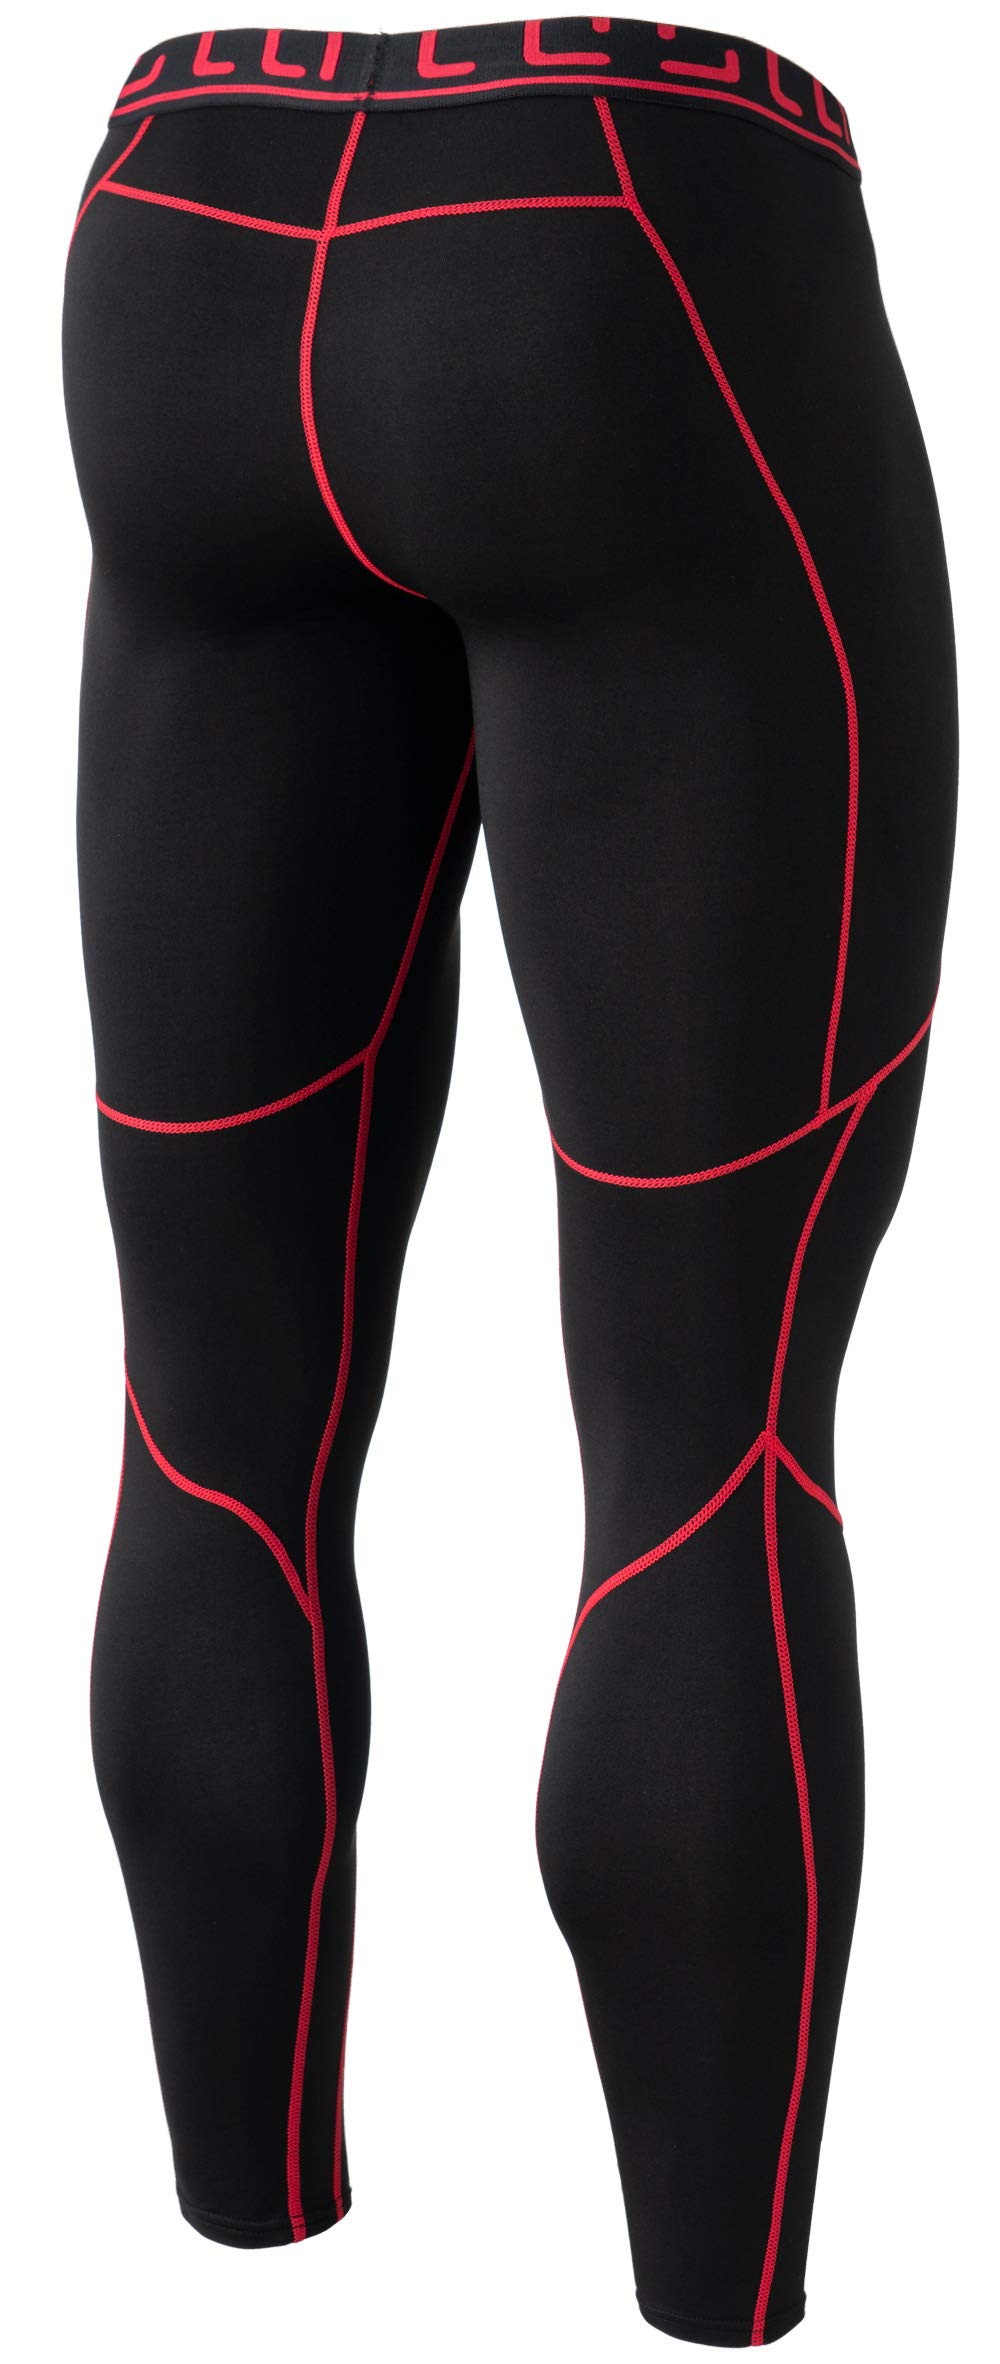 TM-YUP43-KKR_X-Small Tesla Men's Thermal Wintergear Compression Baselayer Pants Leggings Tights YUP43 by TSLA (Image #2)